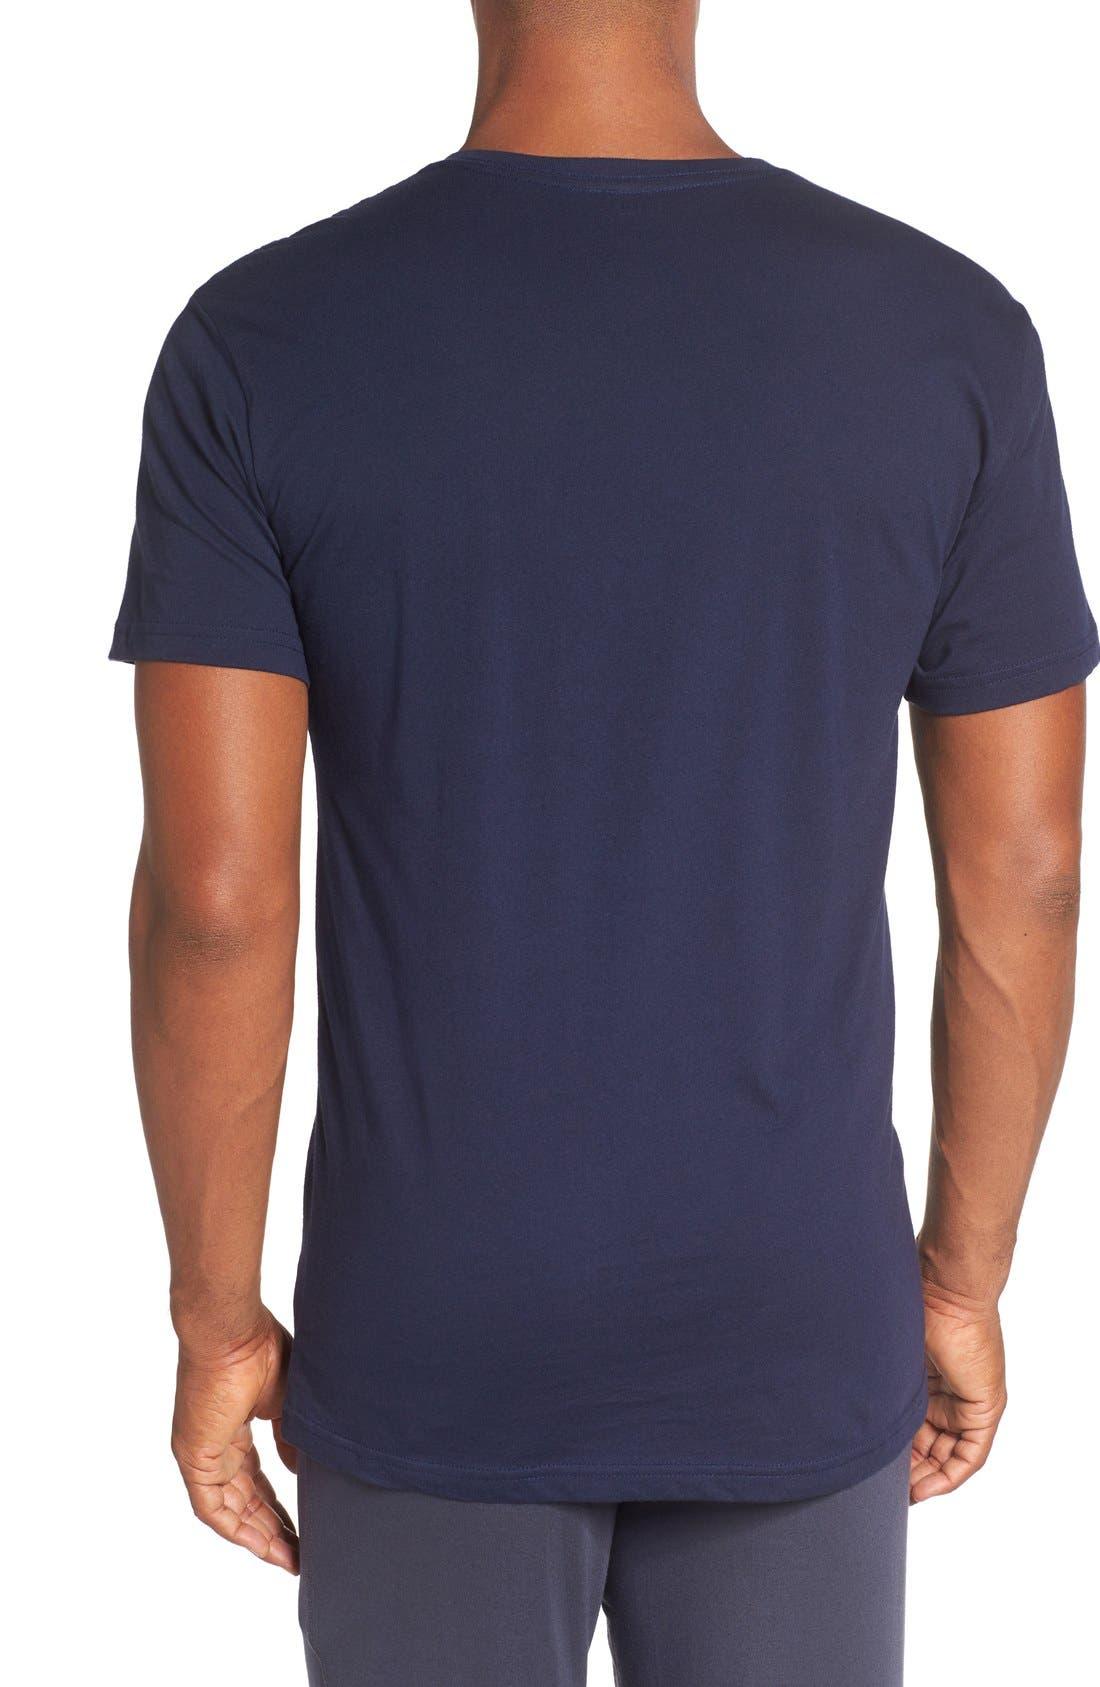 Alternate Image 3  - Polo Ralph Lauren 3-Pack Trim Fit T-Shirt